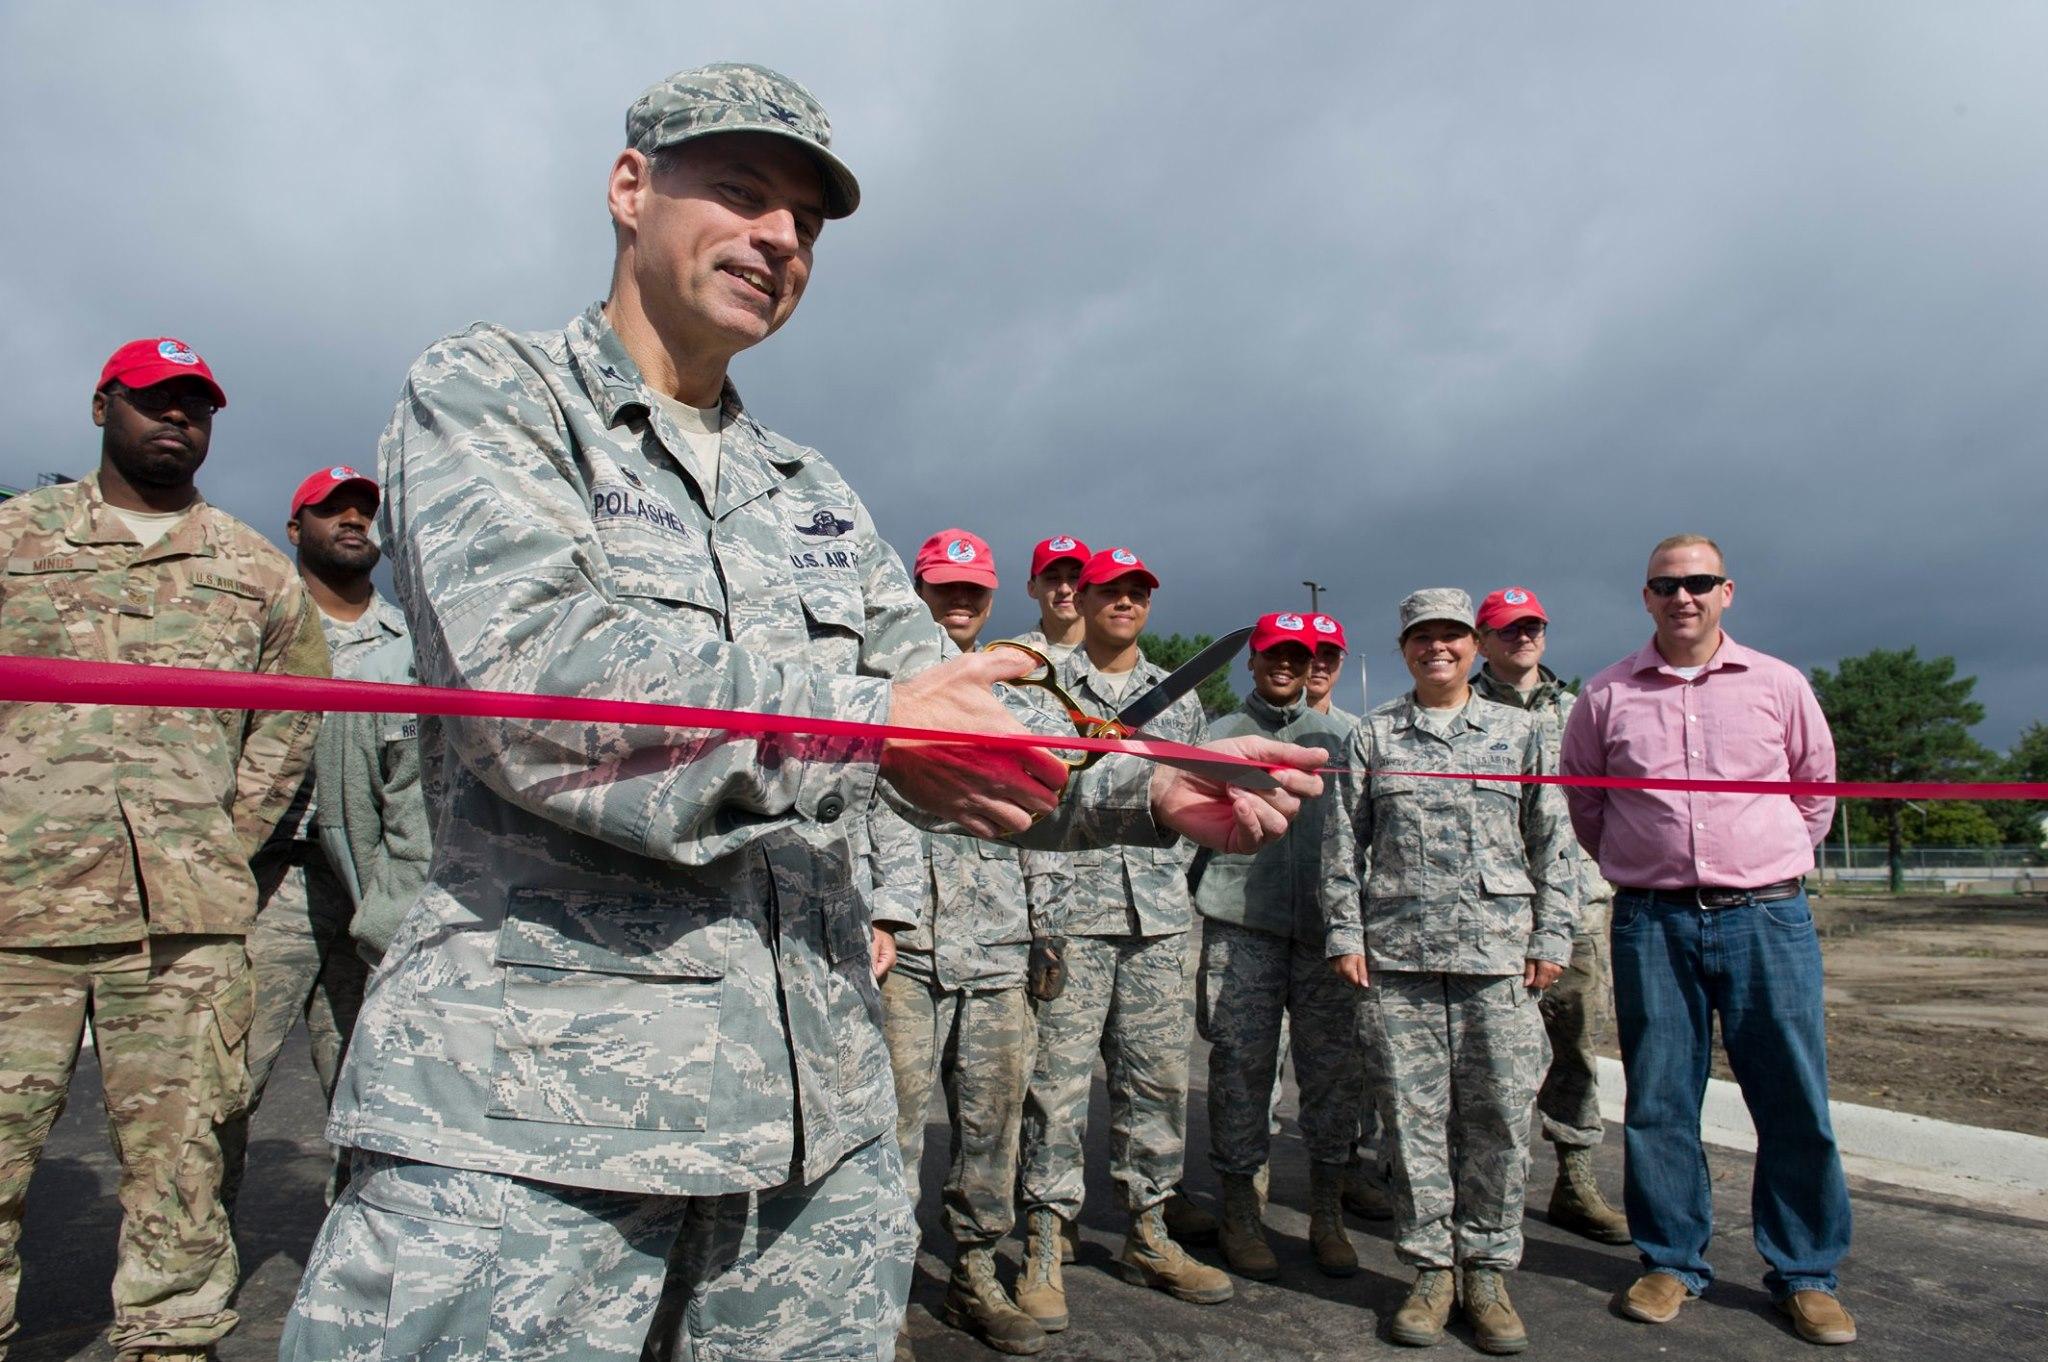 934th Opens New Perimeter Road